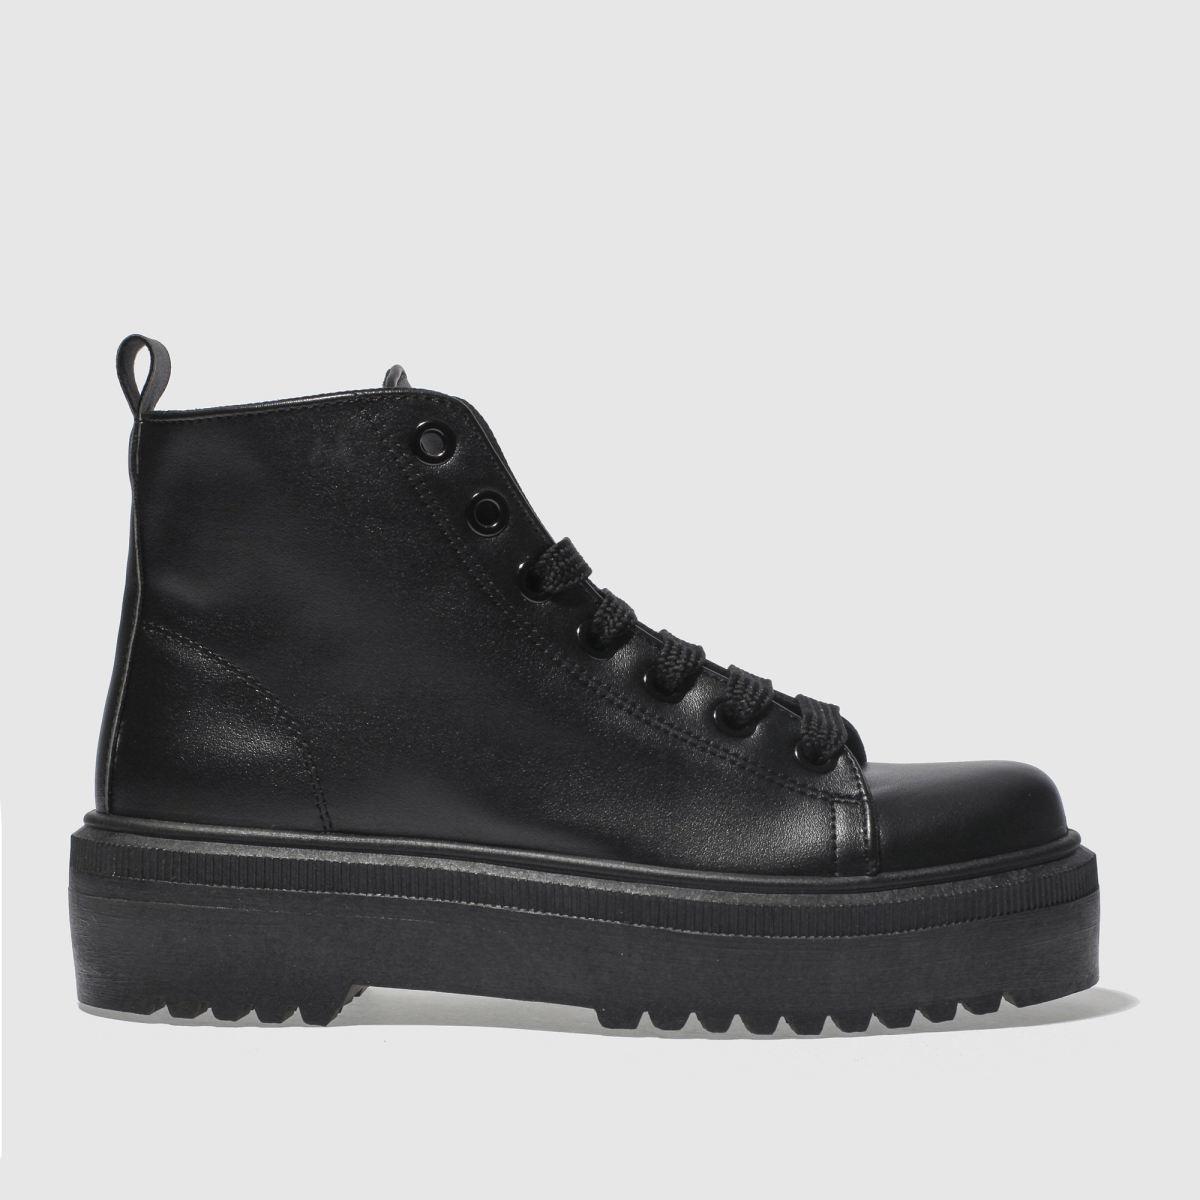 Schuh Black Agnes Boots